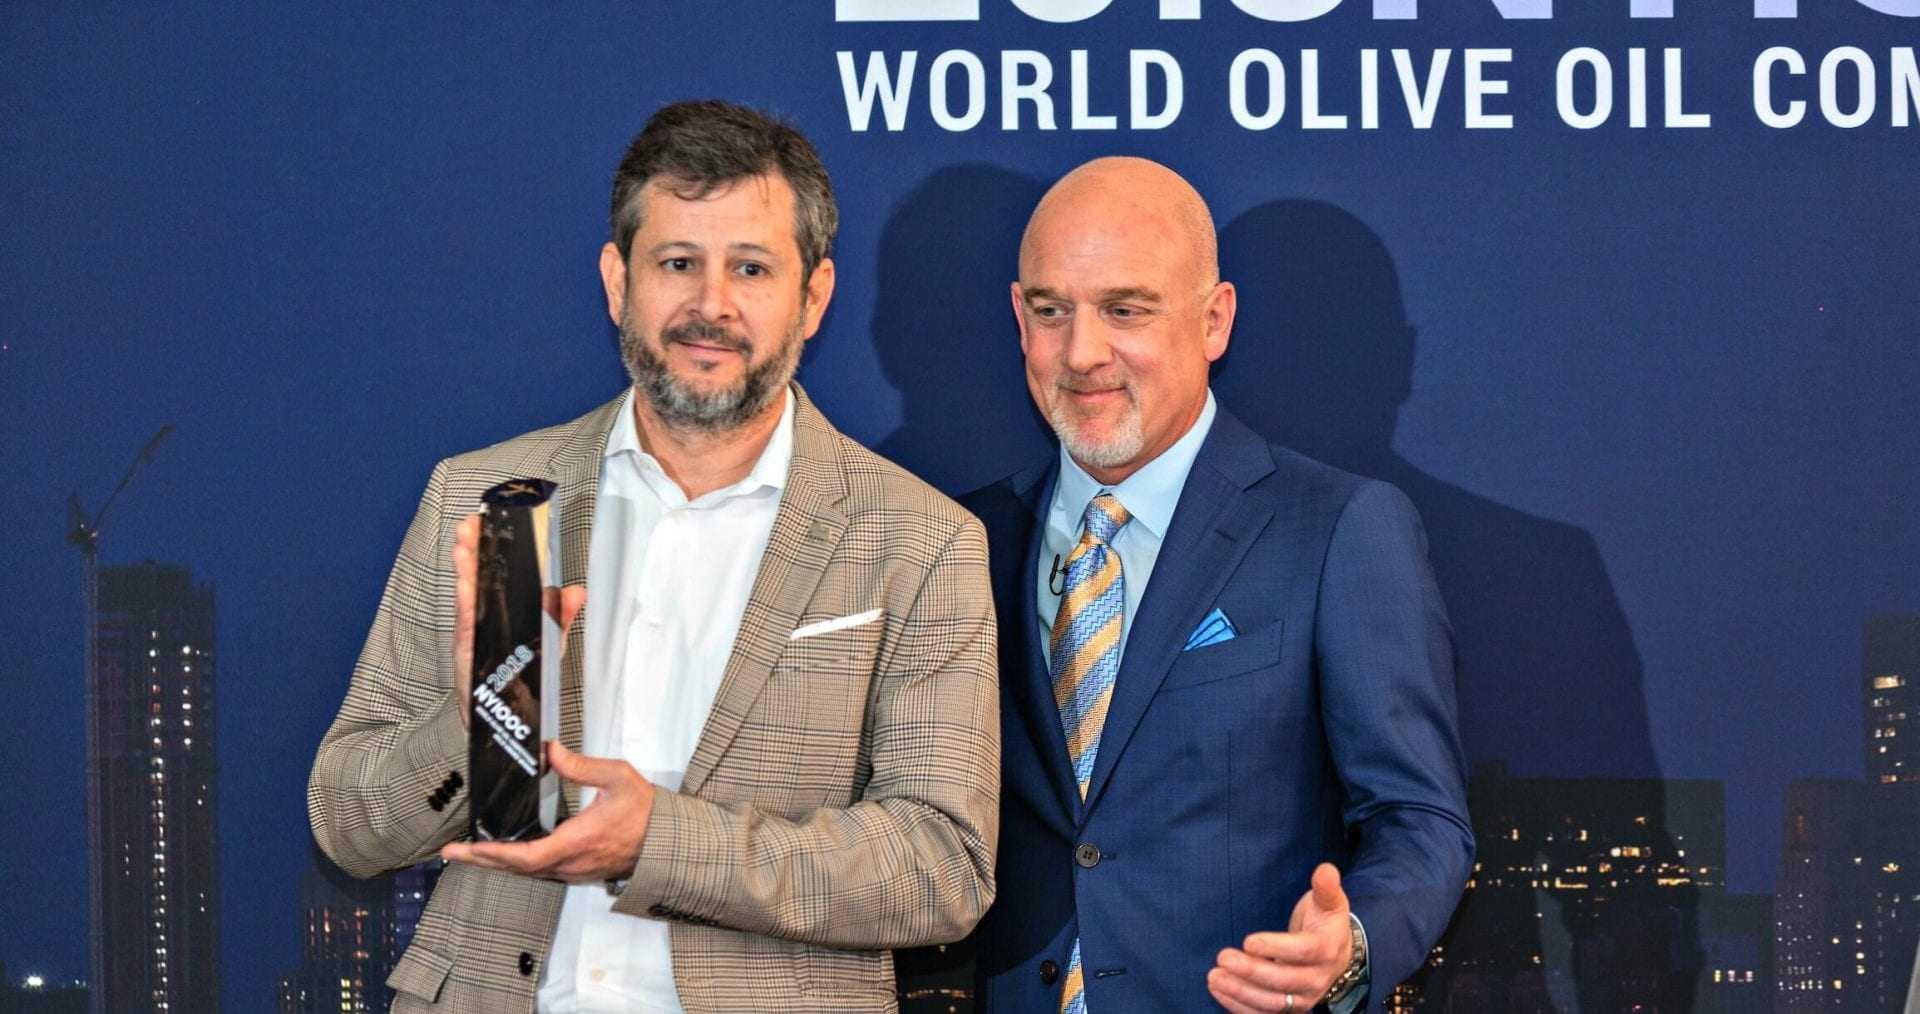 93-spanish-brands-among-worlds-best-olive-oils